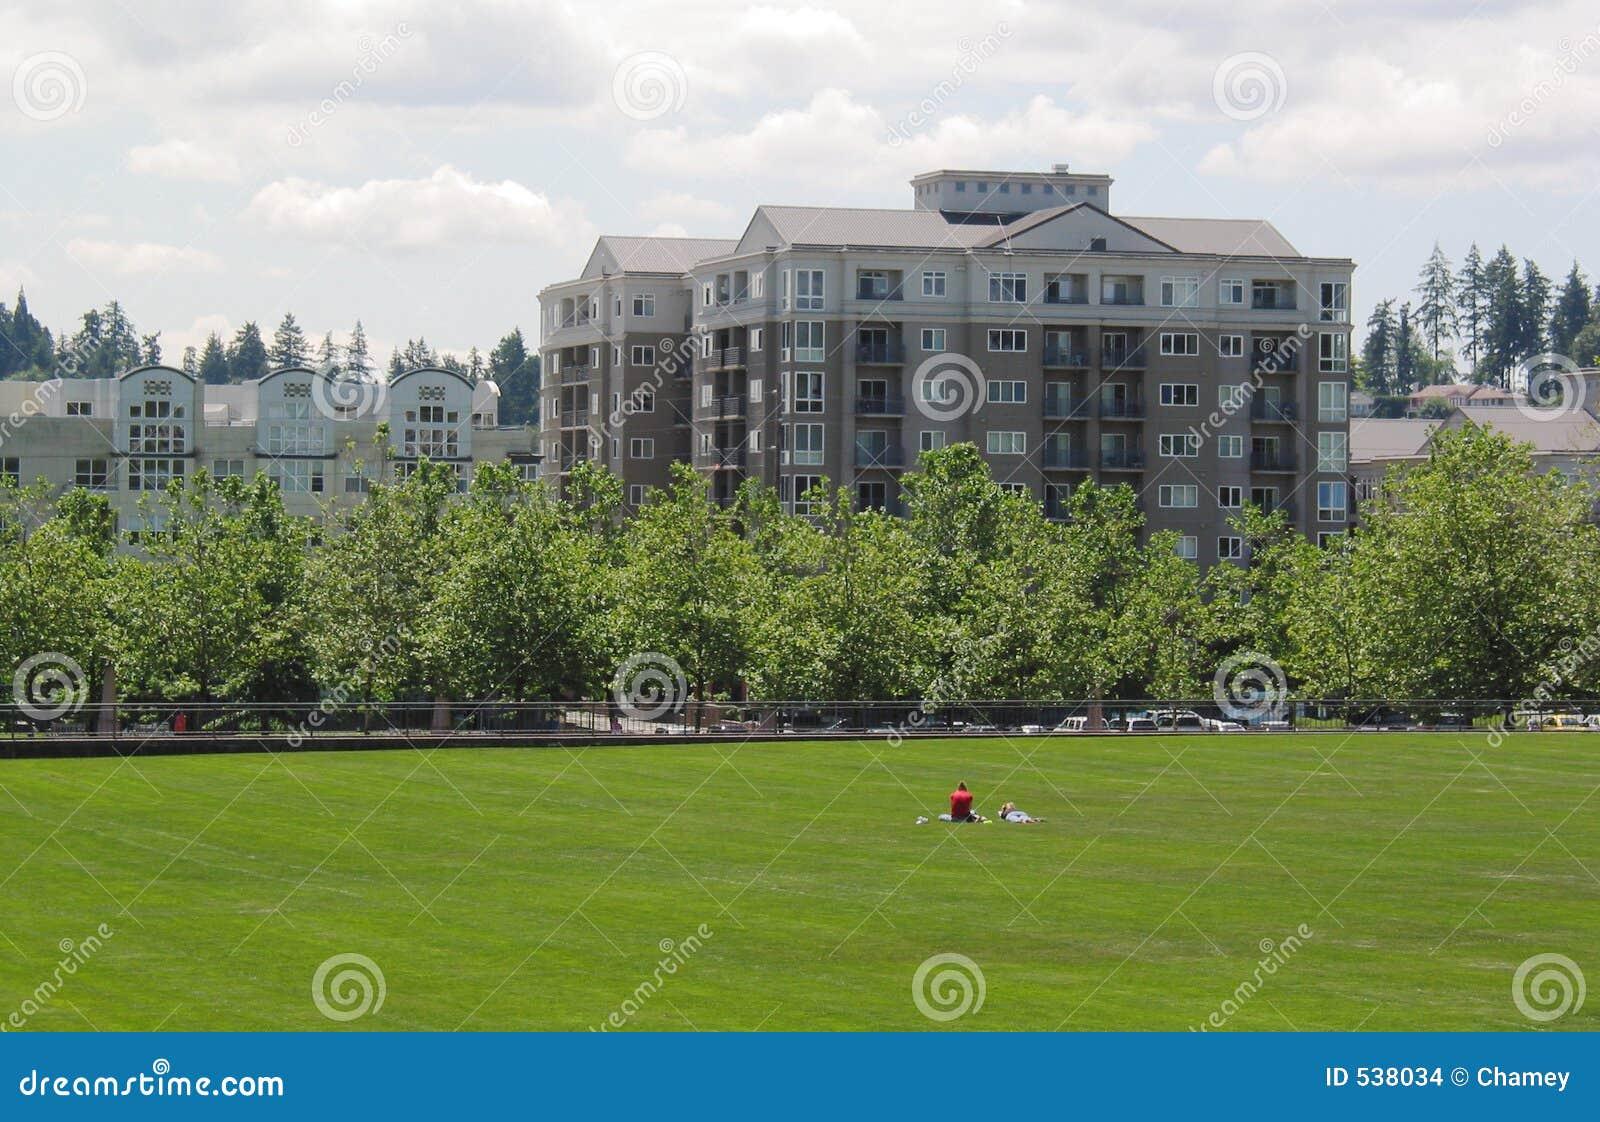 Download 城市公园 库存照片. 图片 包括有 斜倚, 撤退, 公园, 惊人, 国界的, 公寓房, 布哈拉, 汽车, 都市 - 538034